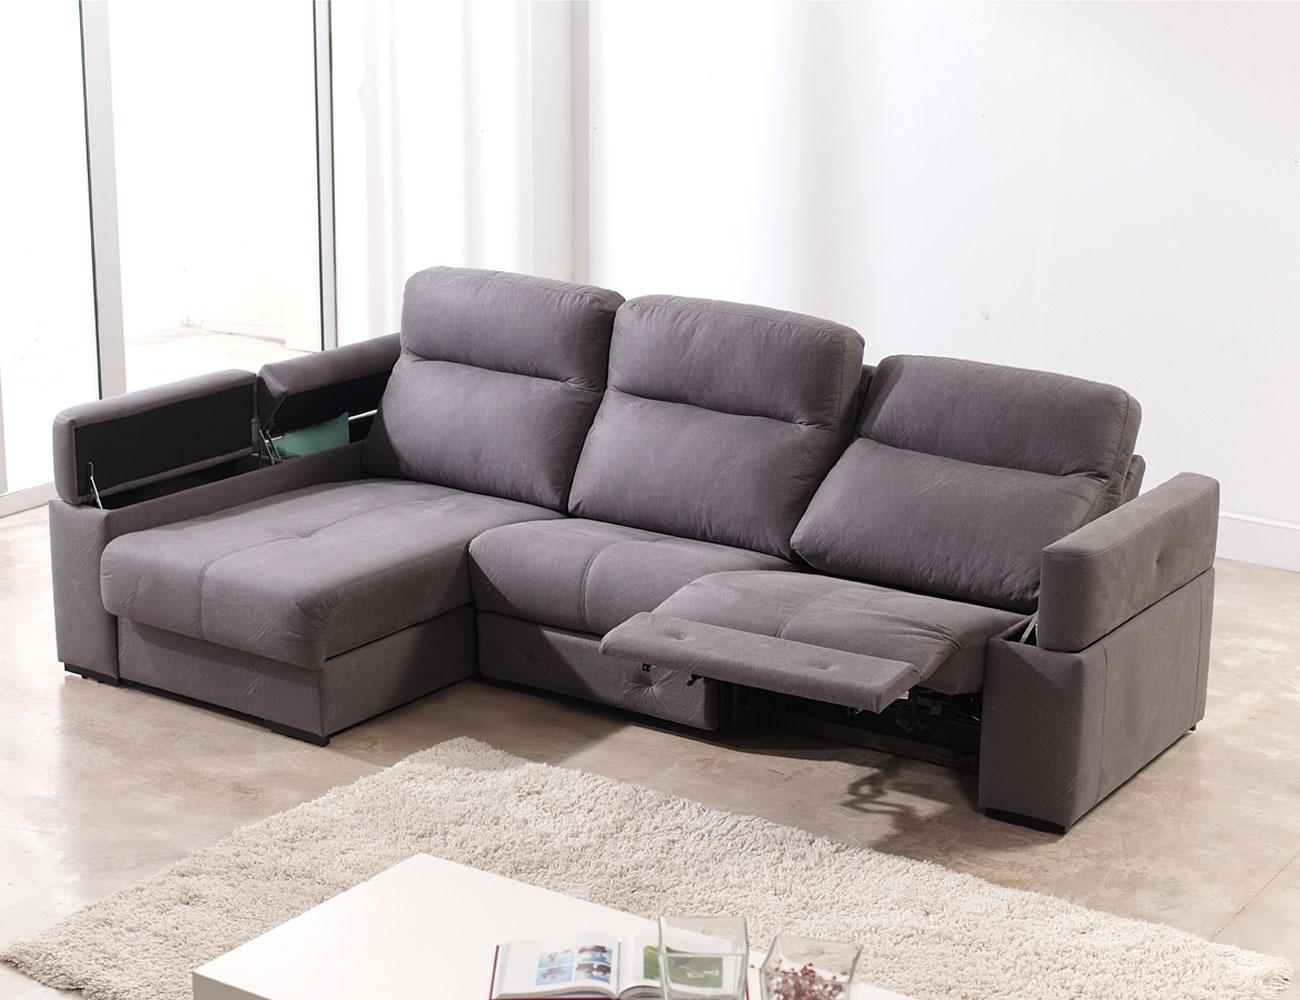 Sofa chaiselongue relax motor electrico 3 arcon 15